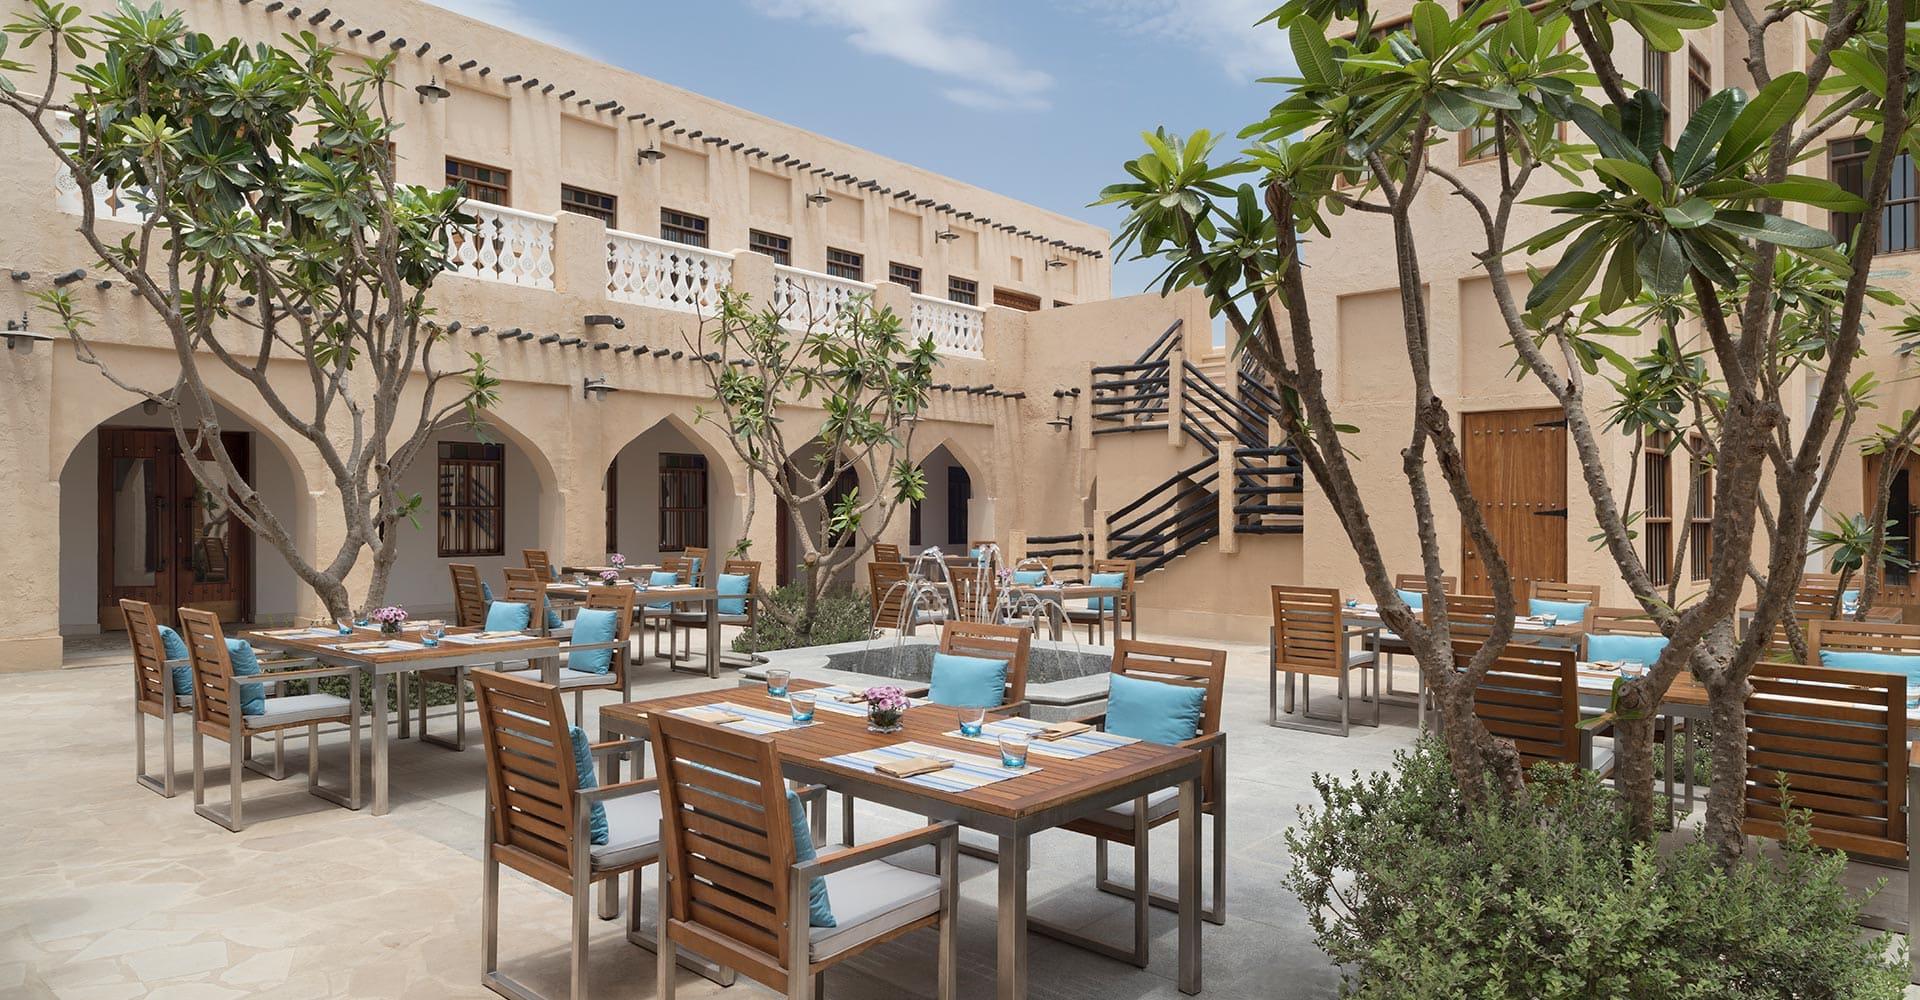 Restaurants in Wakra | Dining at Souq Al Wakra Hotel | Restaurants